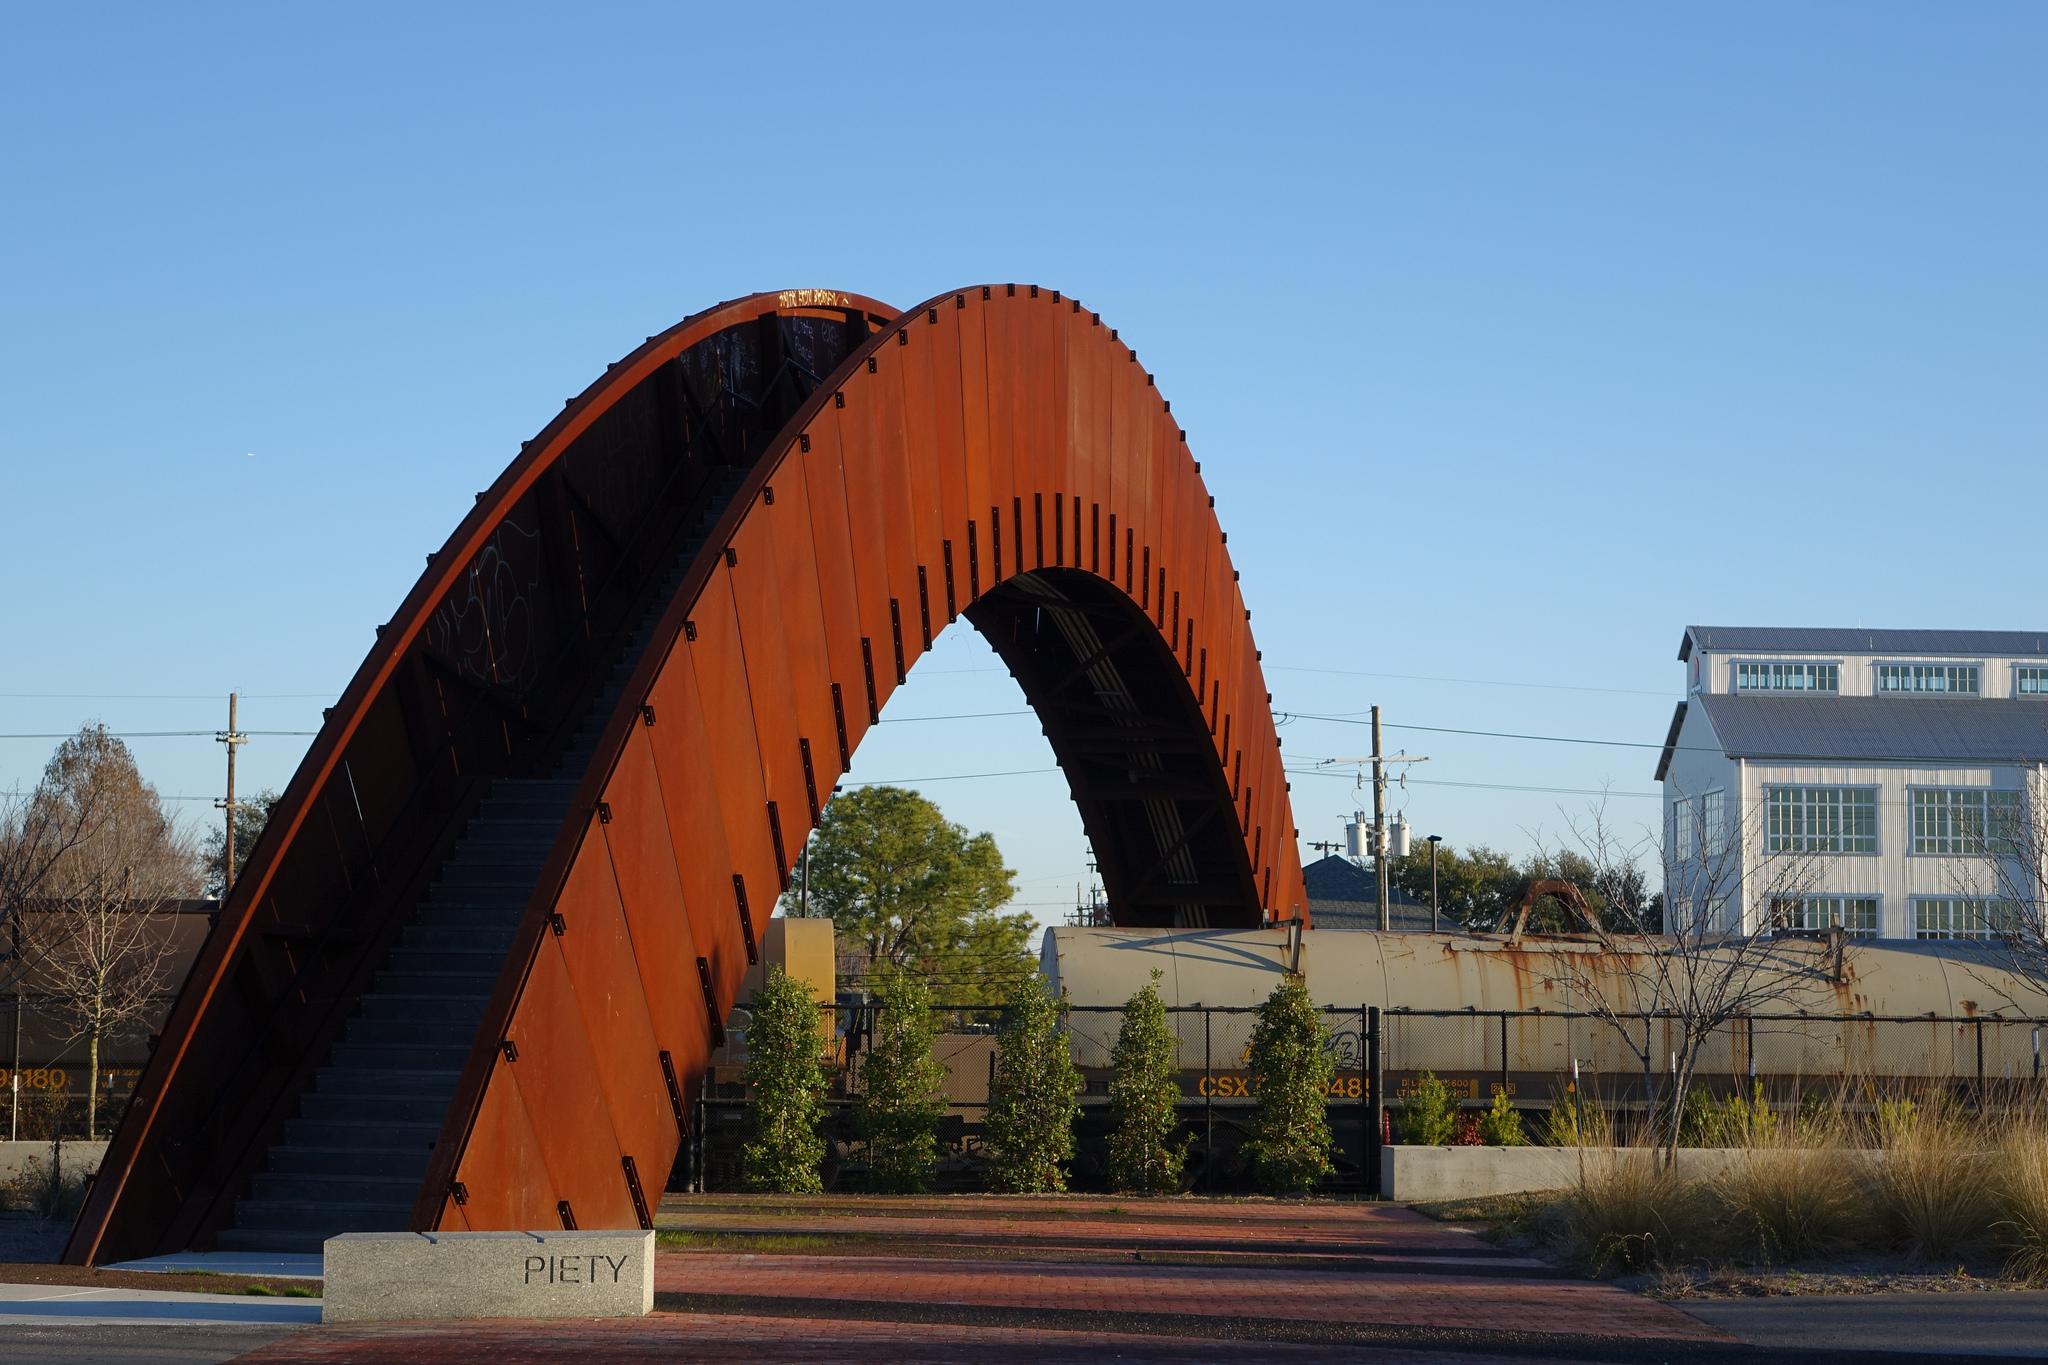 The Piety Street pedestrian bridge at Crescent Park (photo: Paul Broussard)